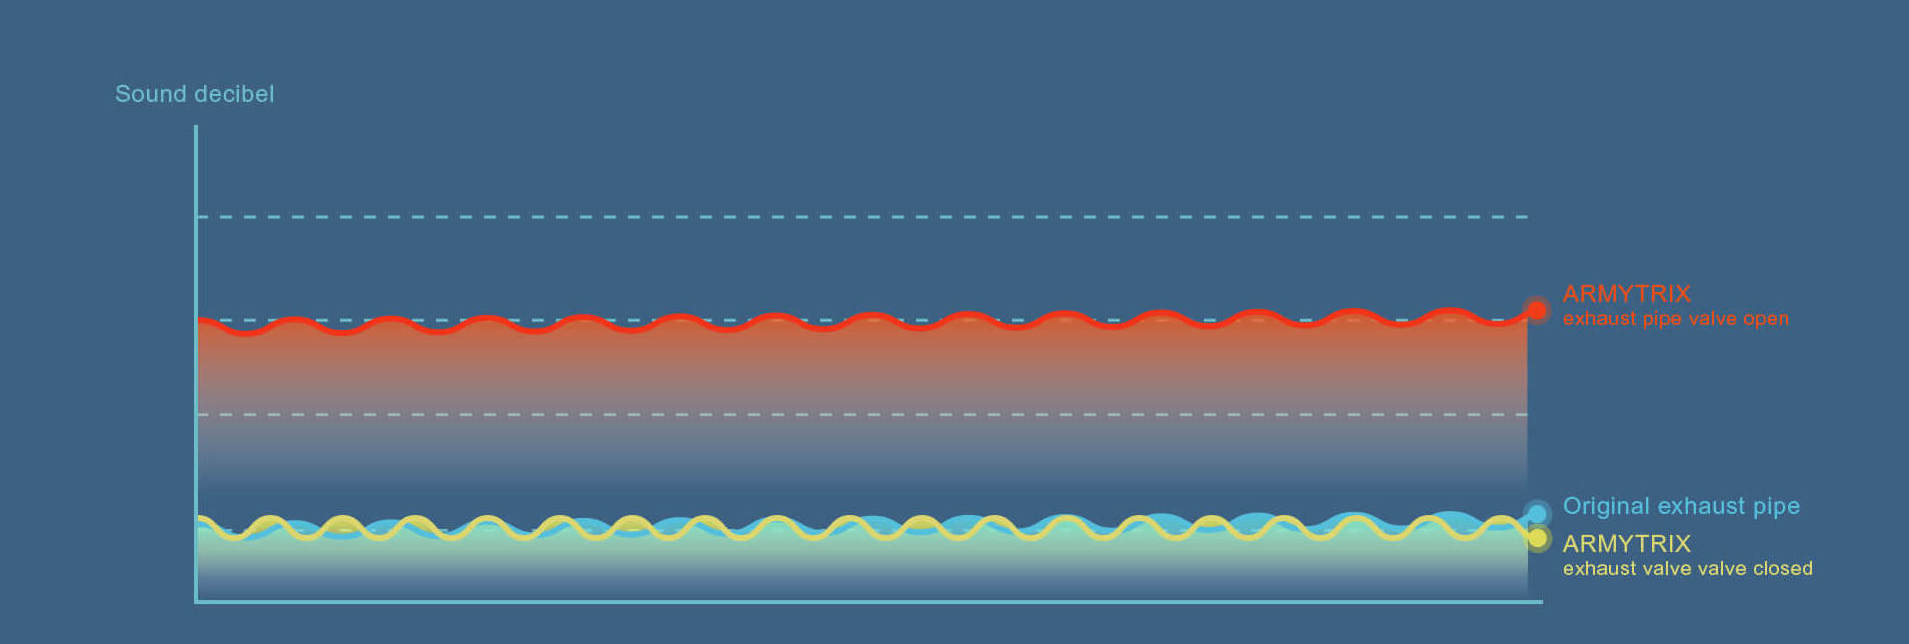 blue_chart_img_1.jpg